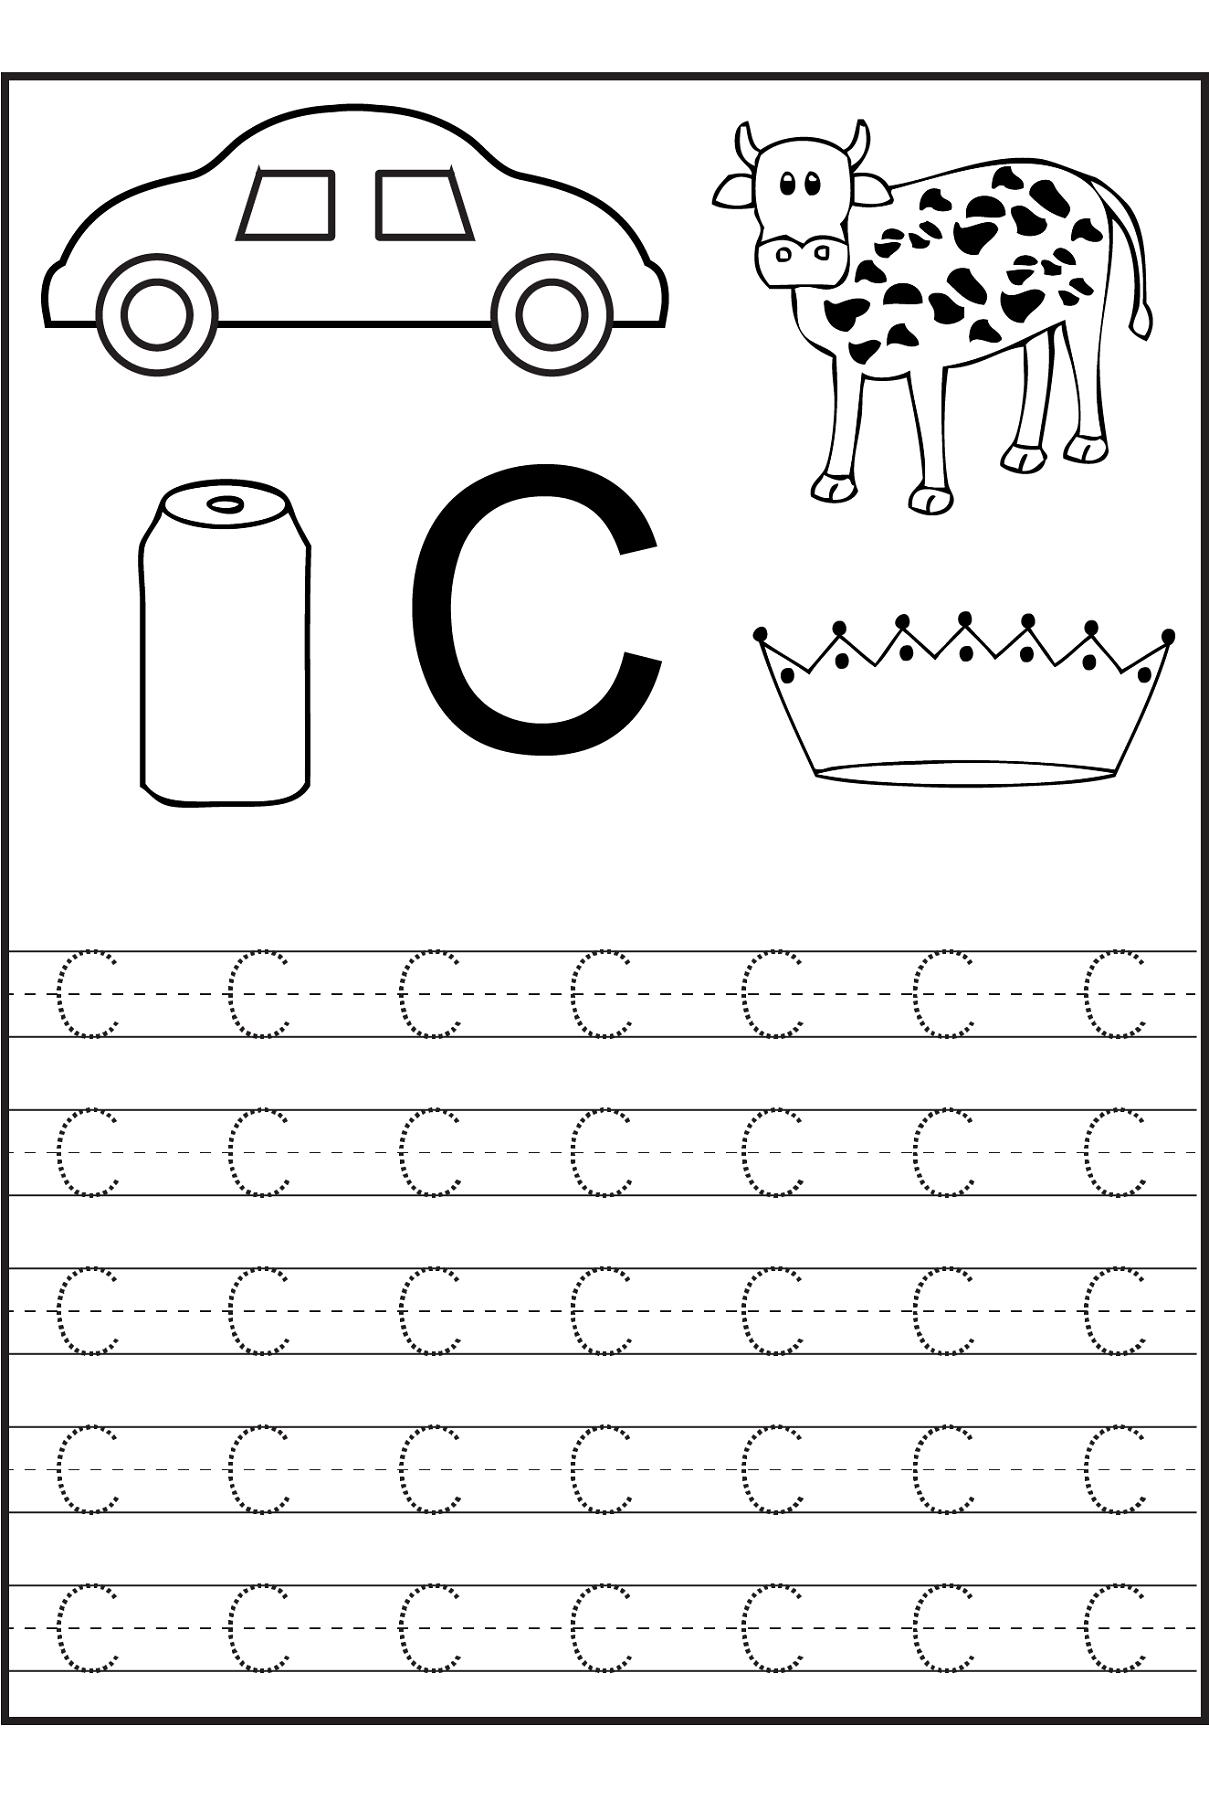 Uppercase Letter C Tracing Worksheet